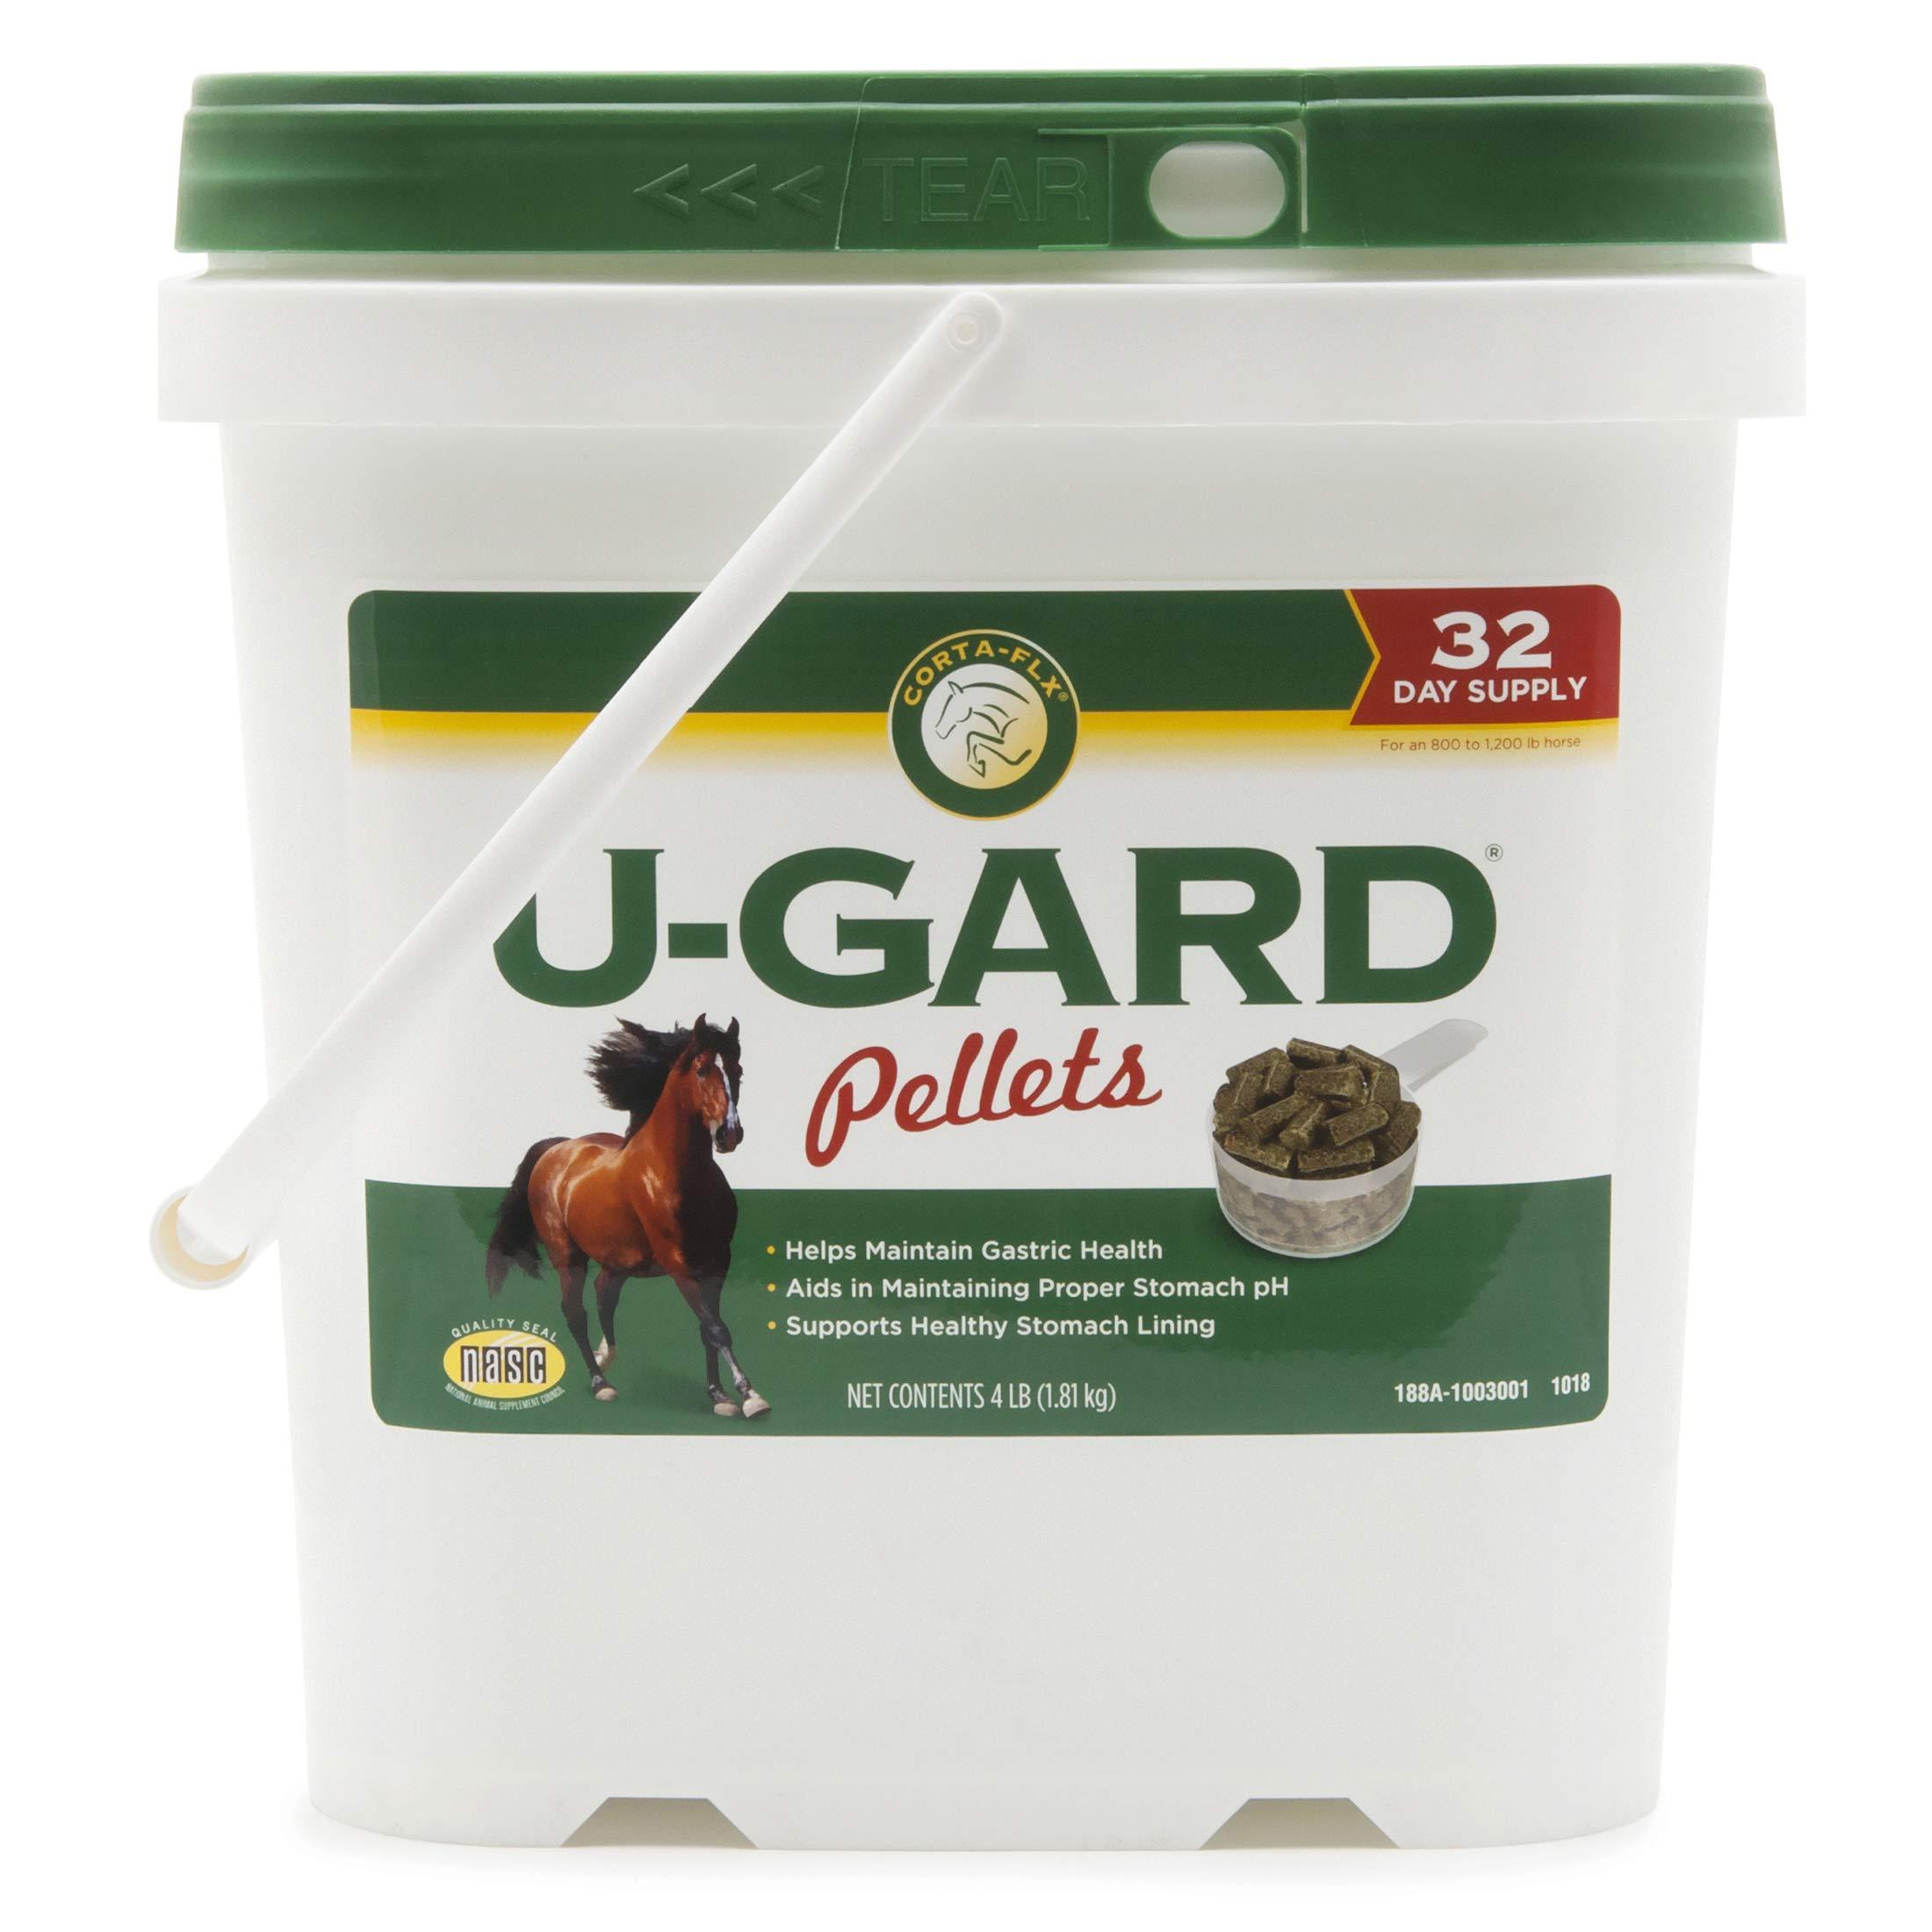 Corta-Flx U-Gard Pellets 4 lb Equine Stomach Supplement by Corta-Flx